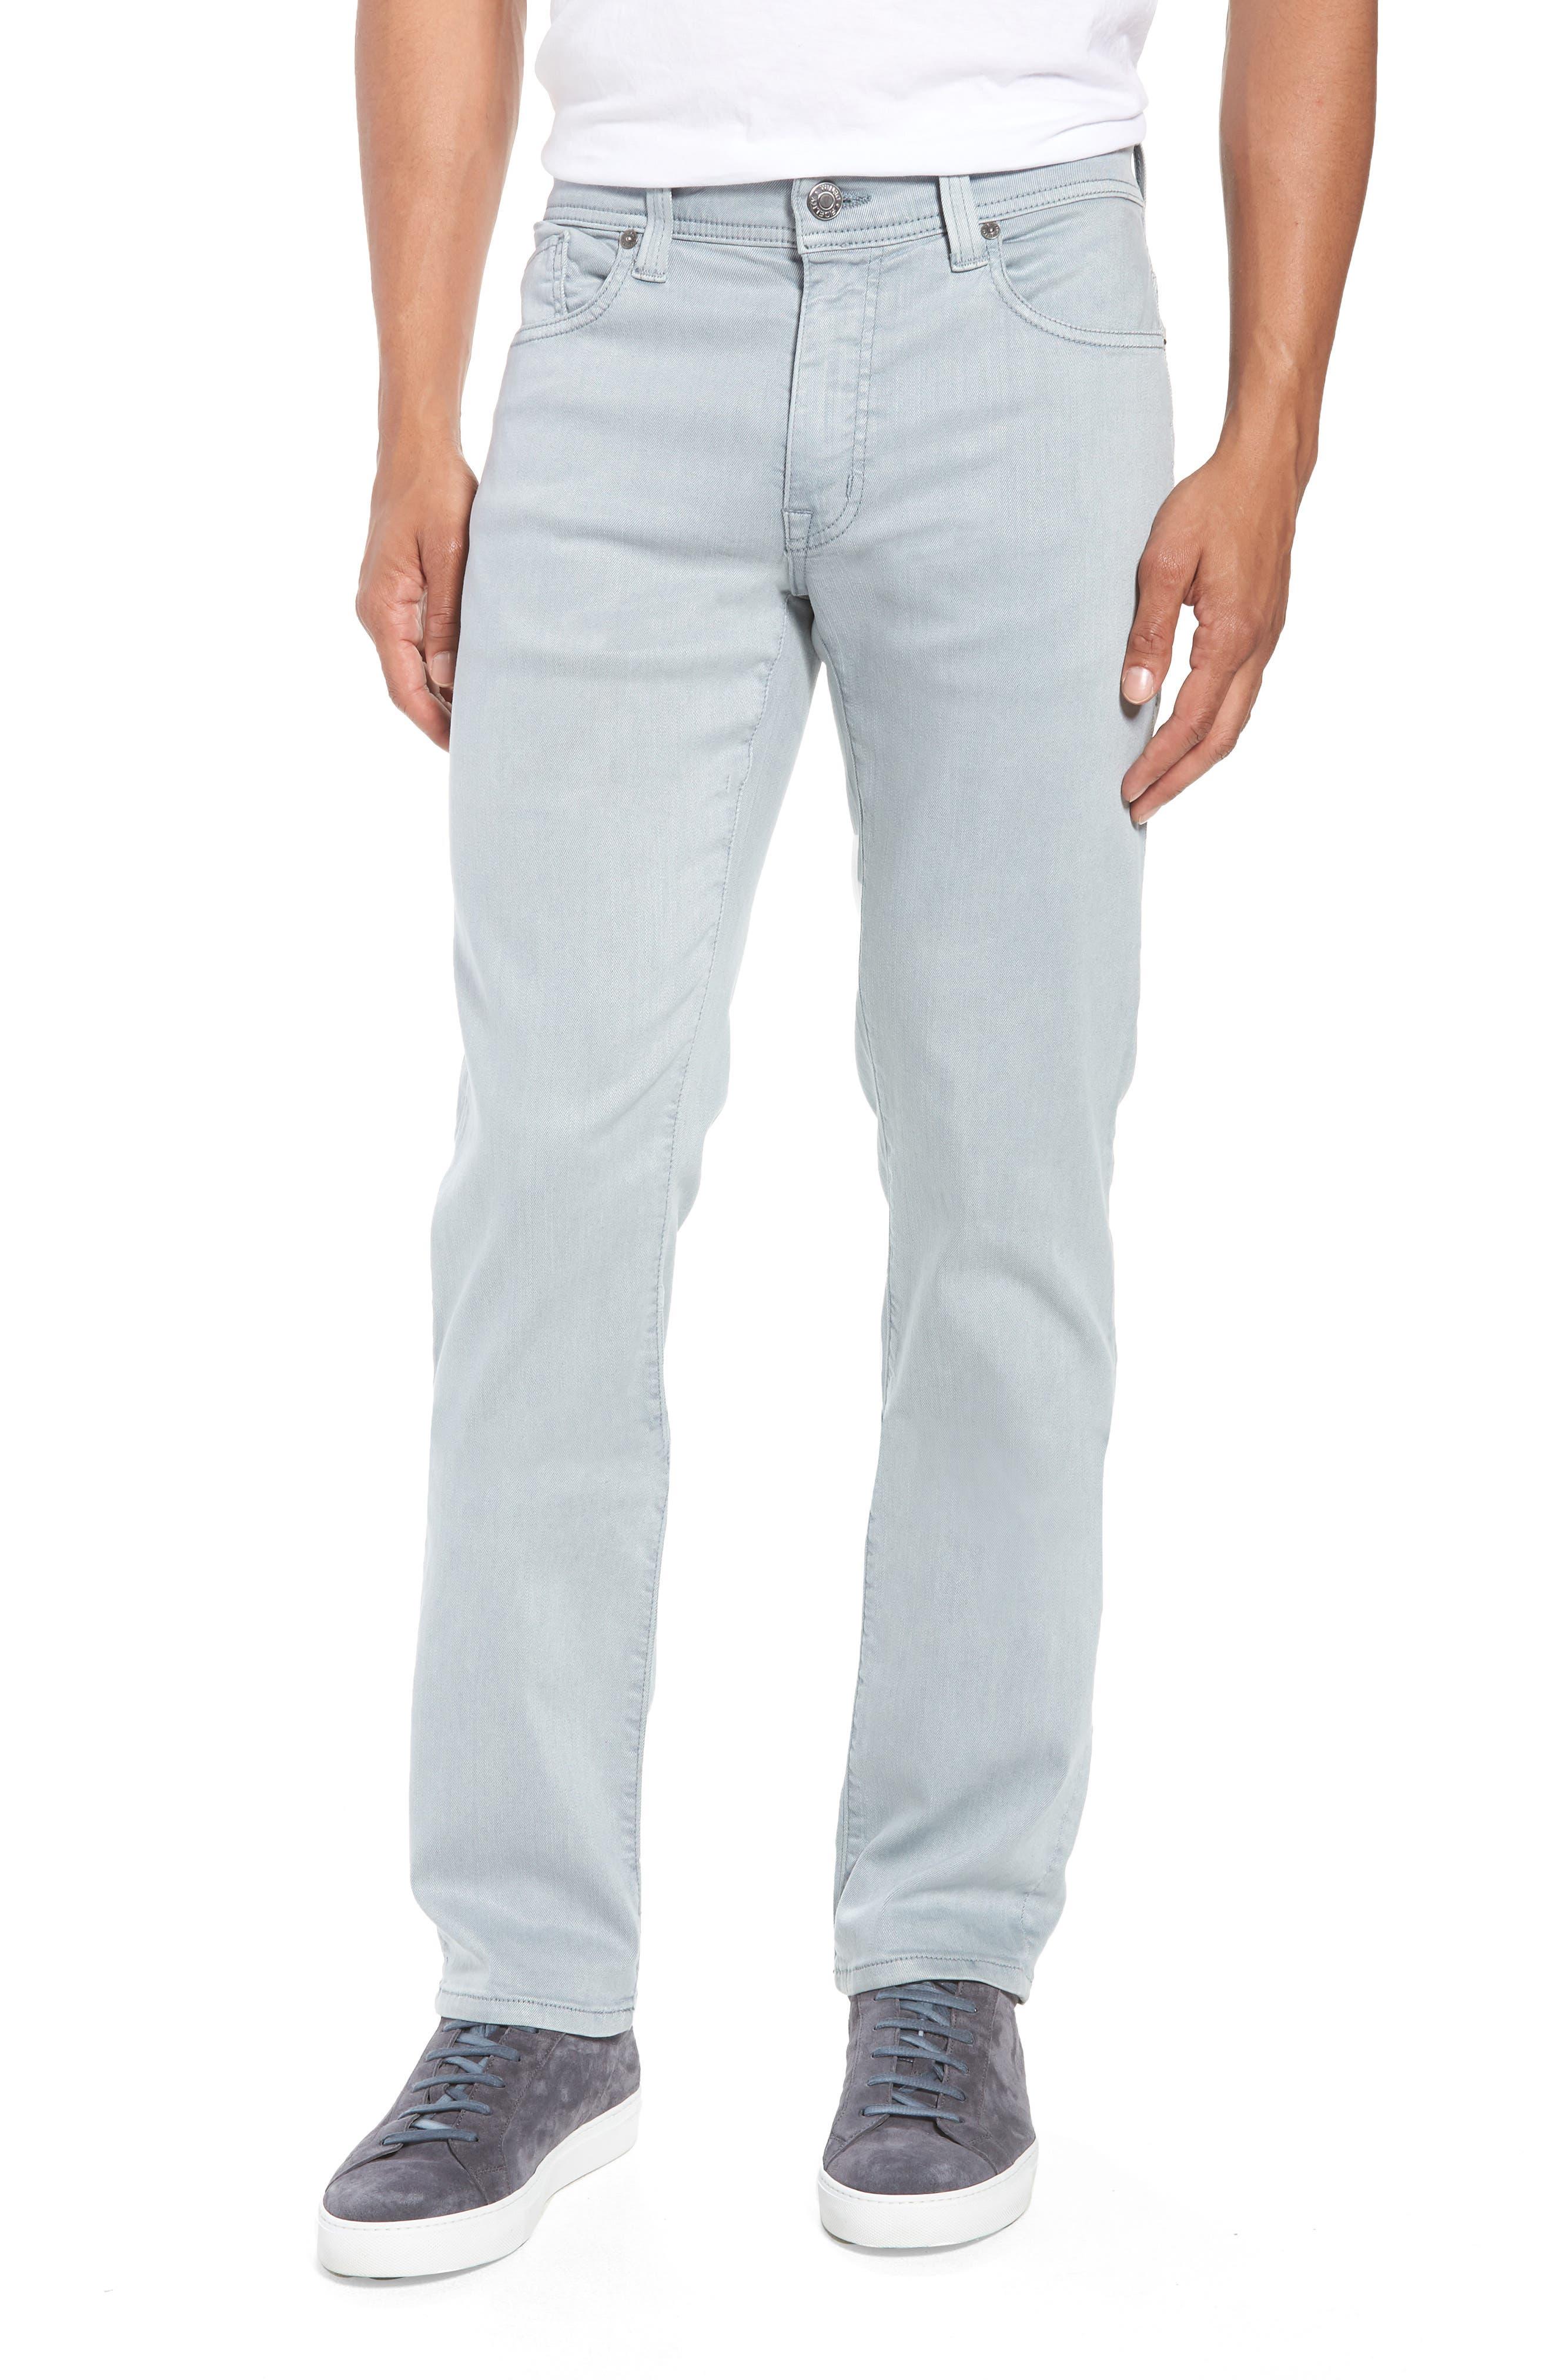 FIDELITY DENIM,                             Fidelity Jimmy Slim Straight Leg Jeans,                             Main thumbnail 1, color,                             020